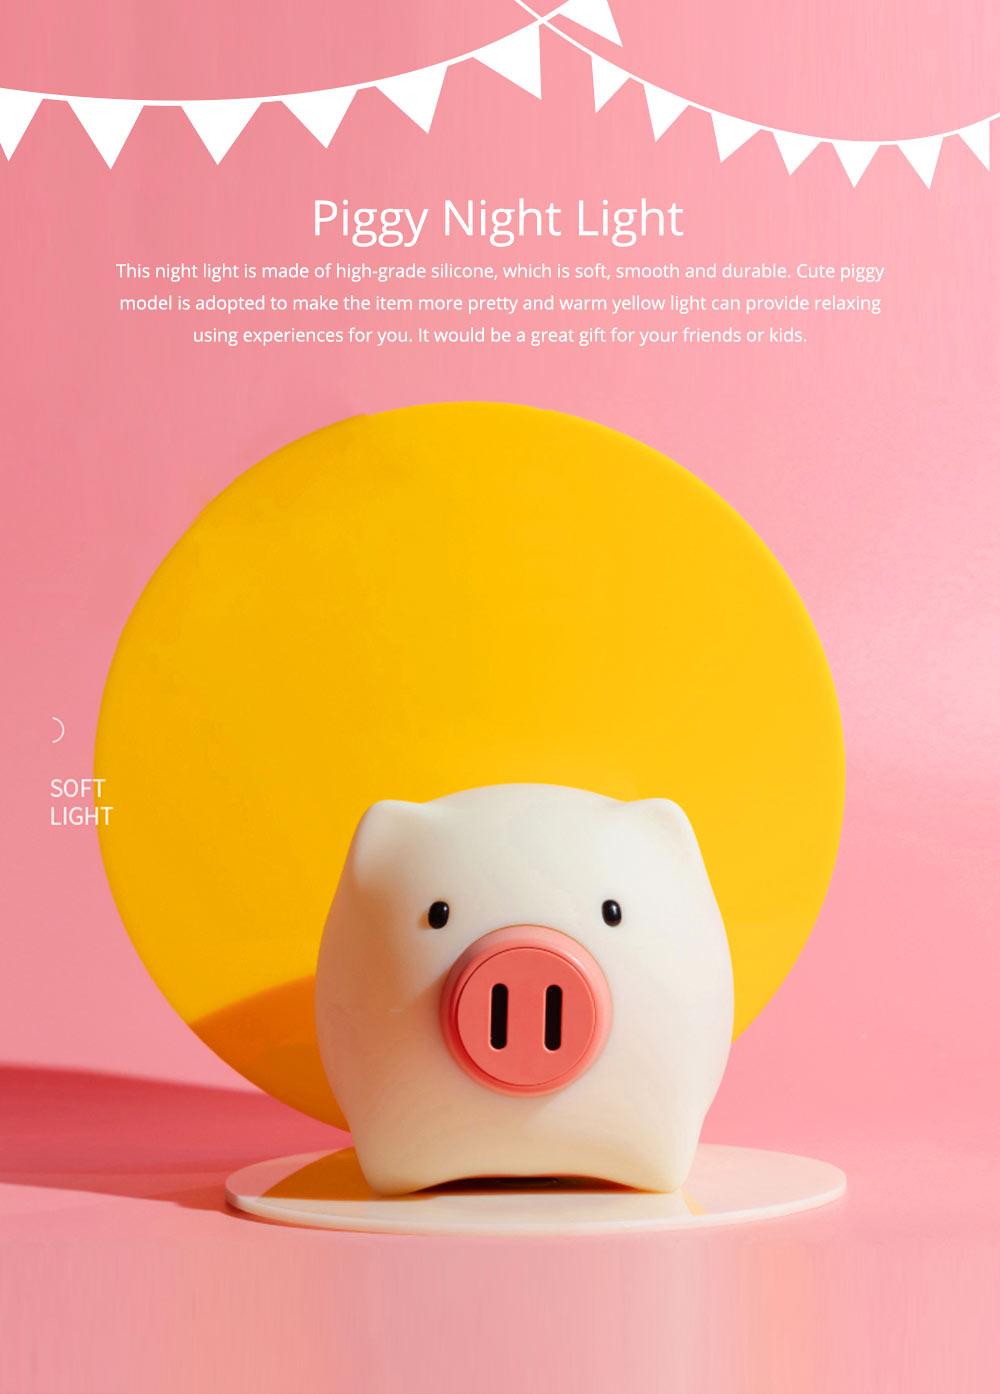 Pig Night Light, Ultrasoft Skin-friendly Silicone Piggy Light Present For Girls or Child 0